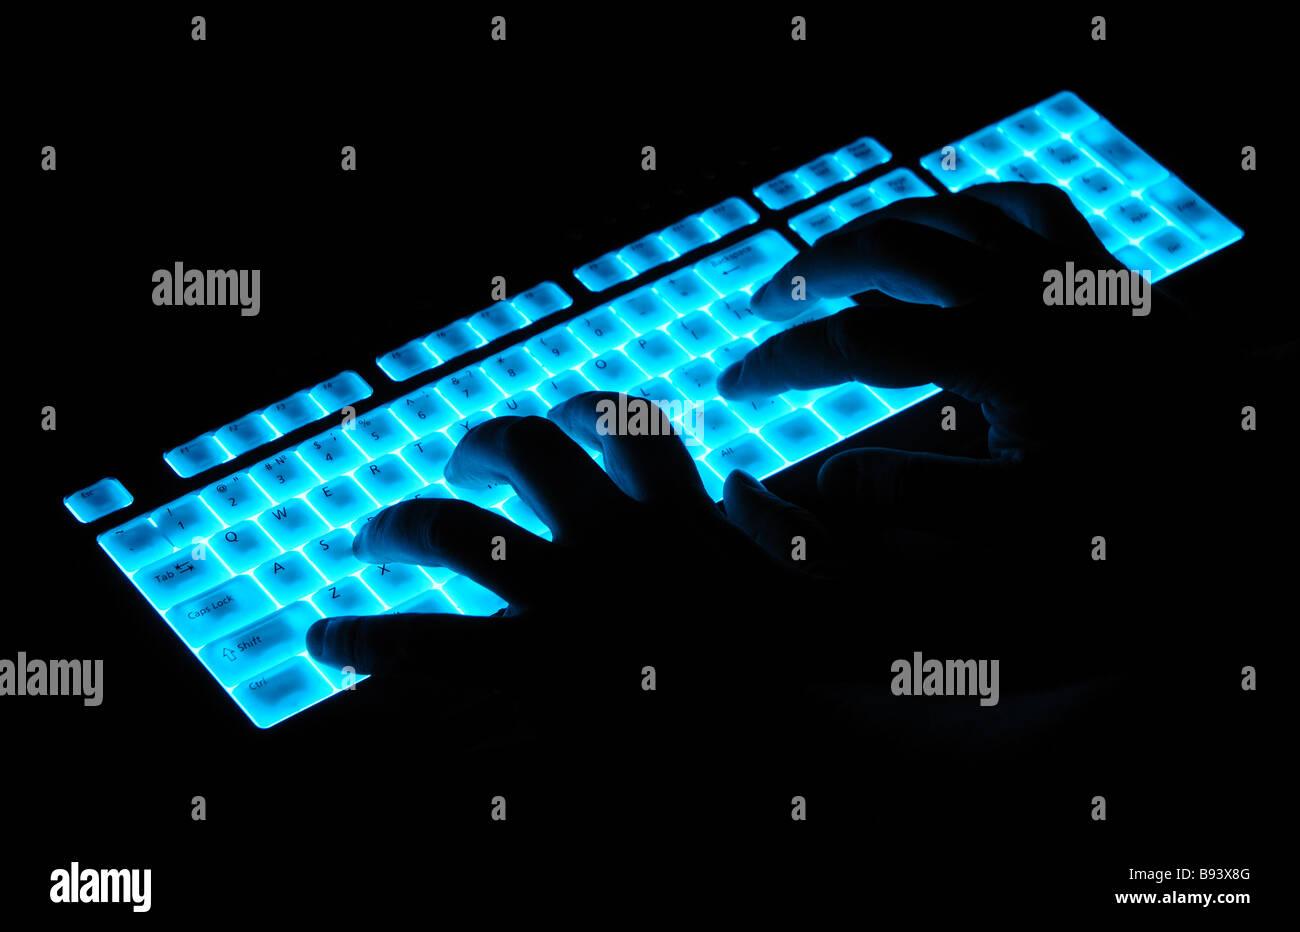 hands over luminous keyboard - Stock Image